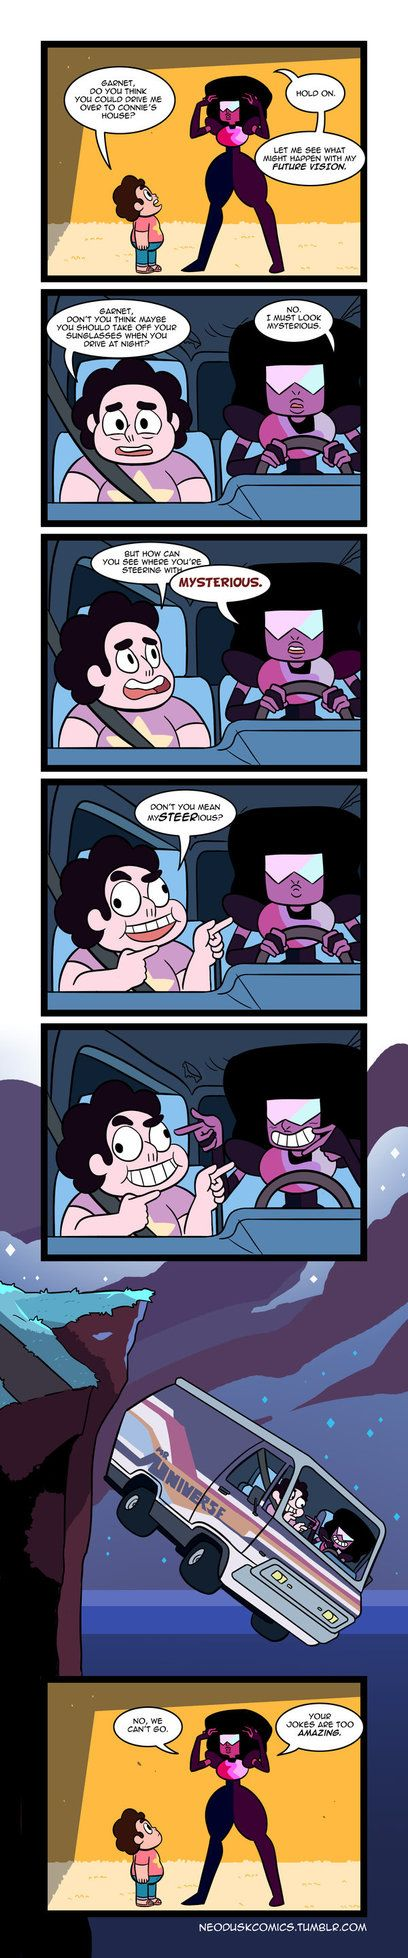 Steven Universe: Steven Puniverse by Neodusk